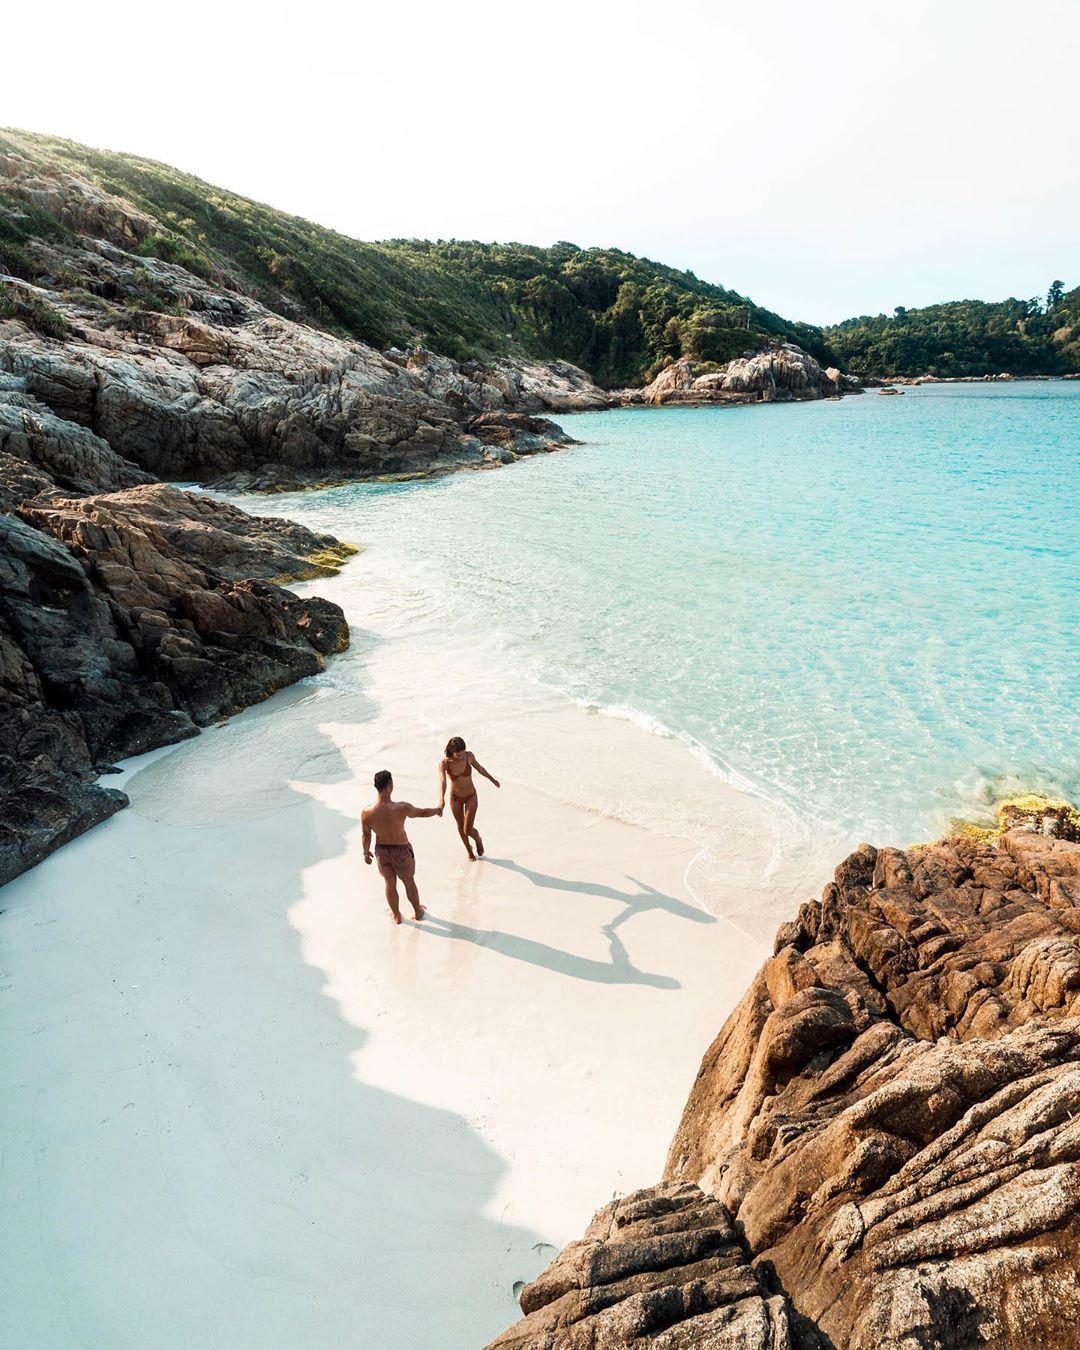 Malaysia Beaches: Perhentian Islands Guide: Explore Malaysia's Beach